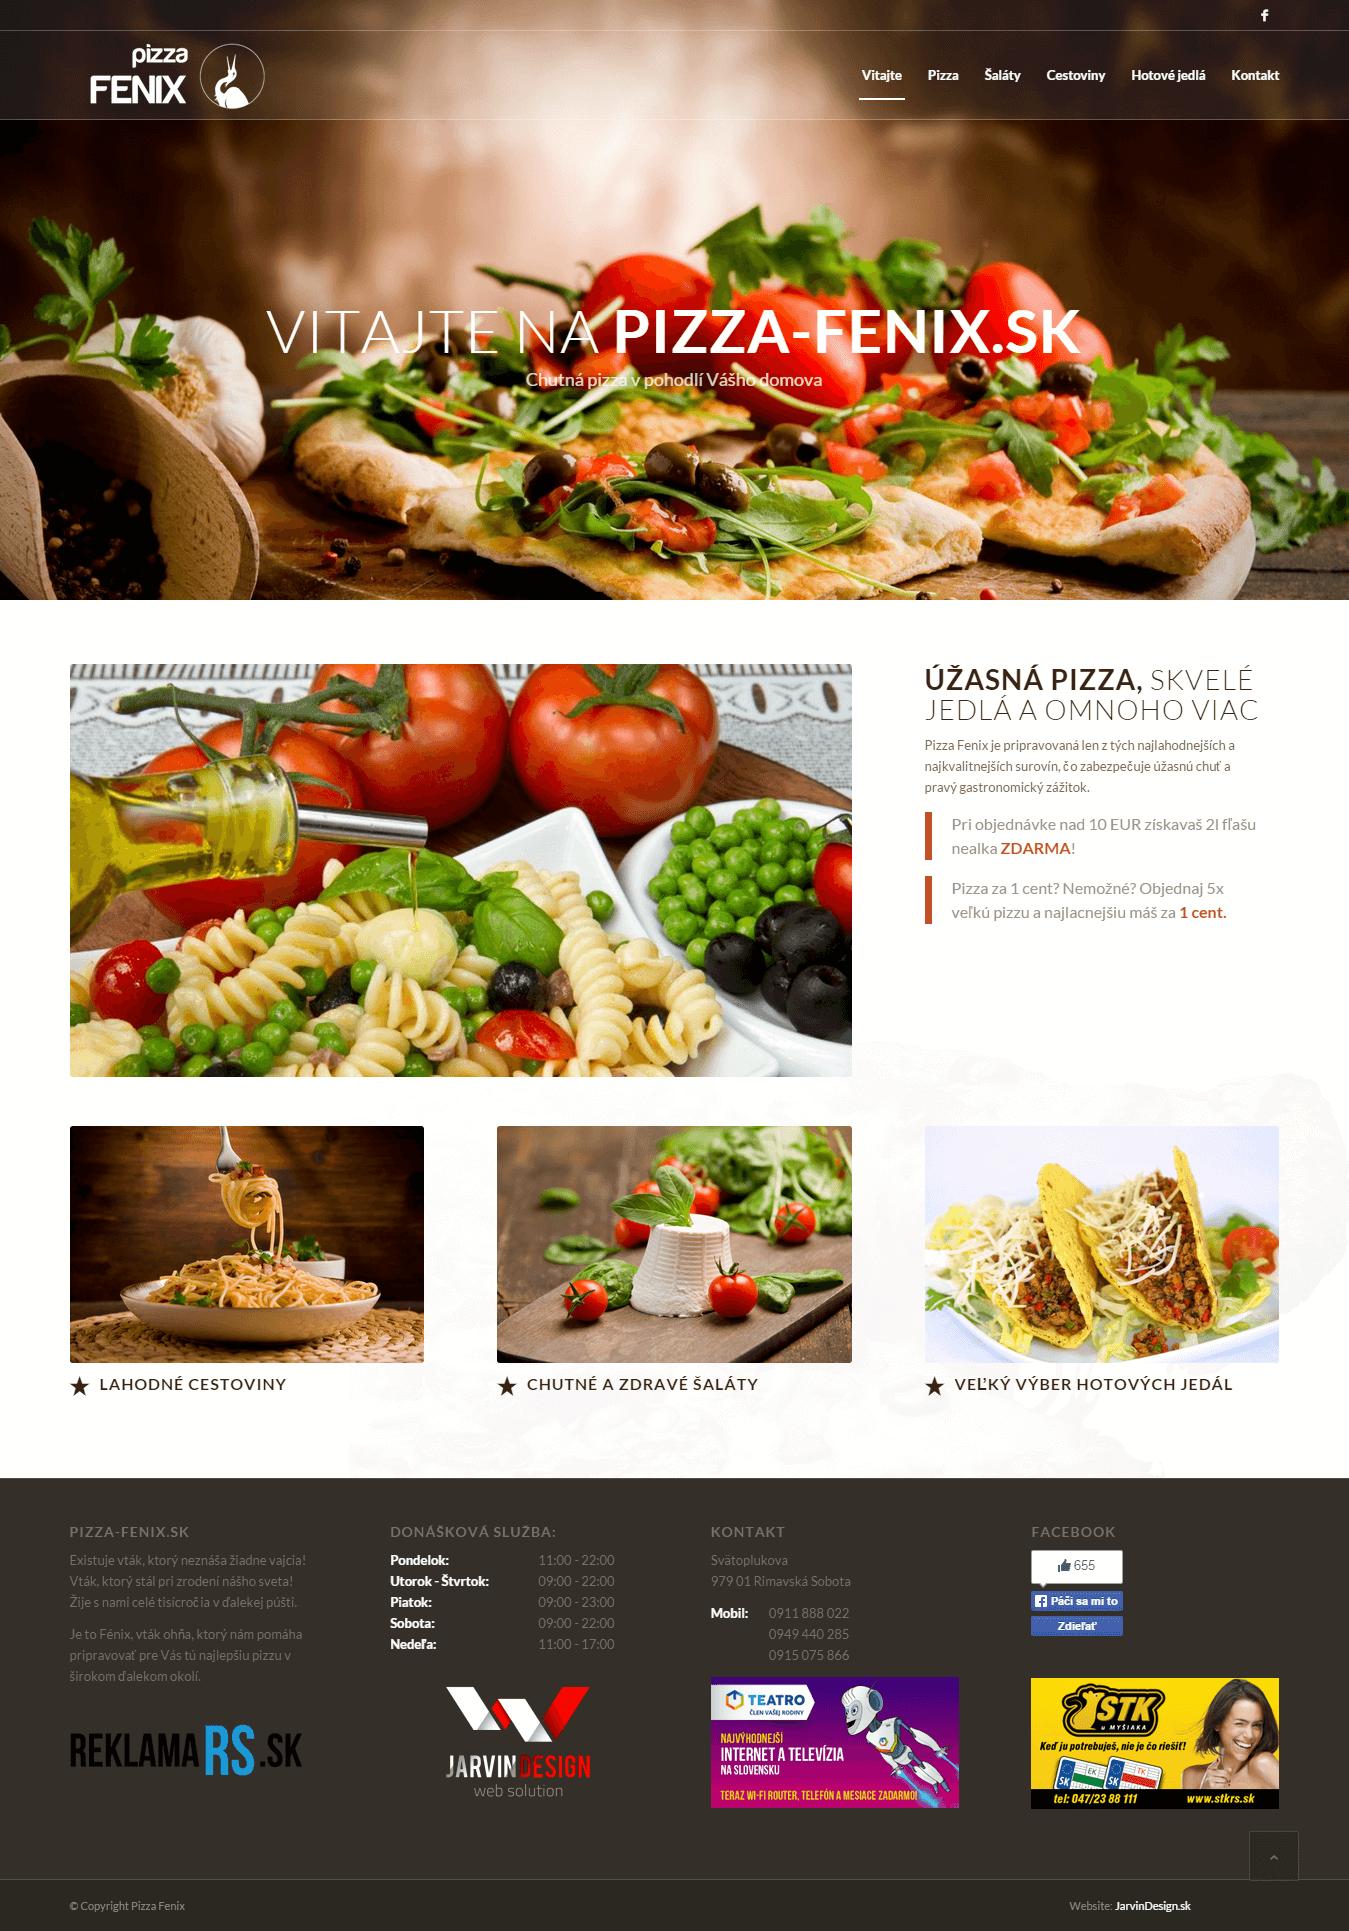 Pizza-Fenix - titulná stránka